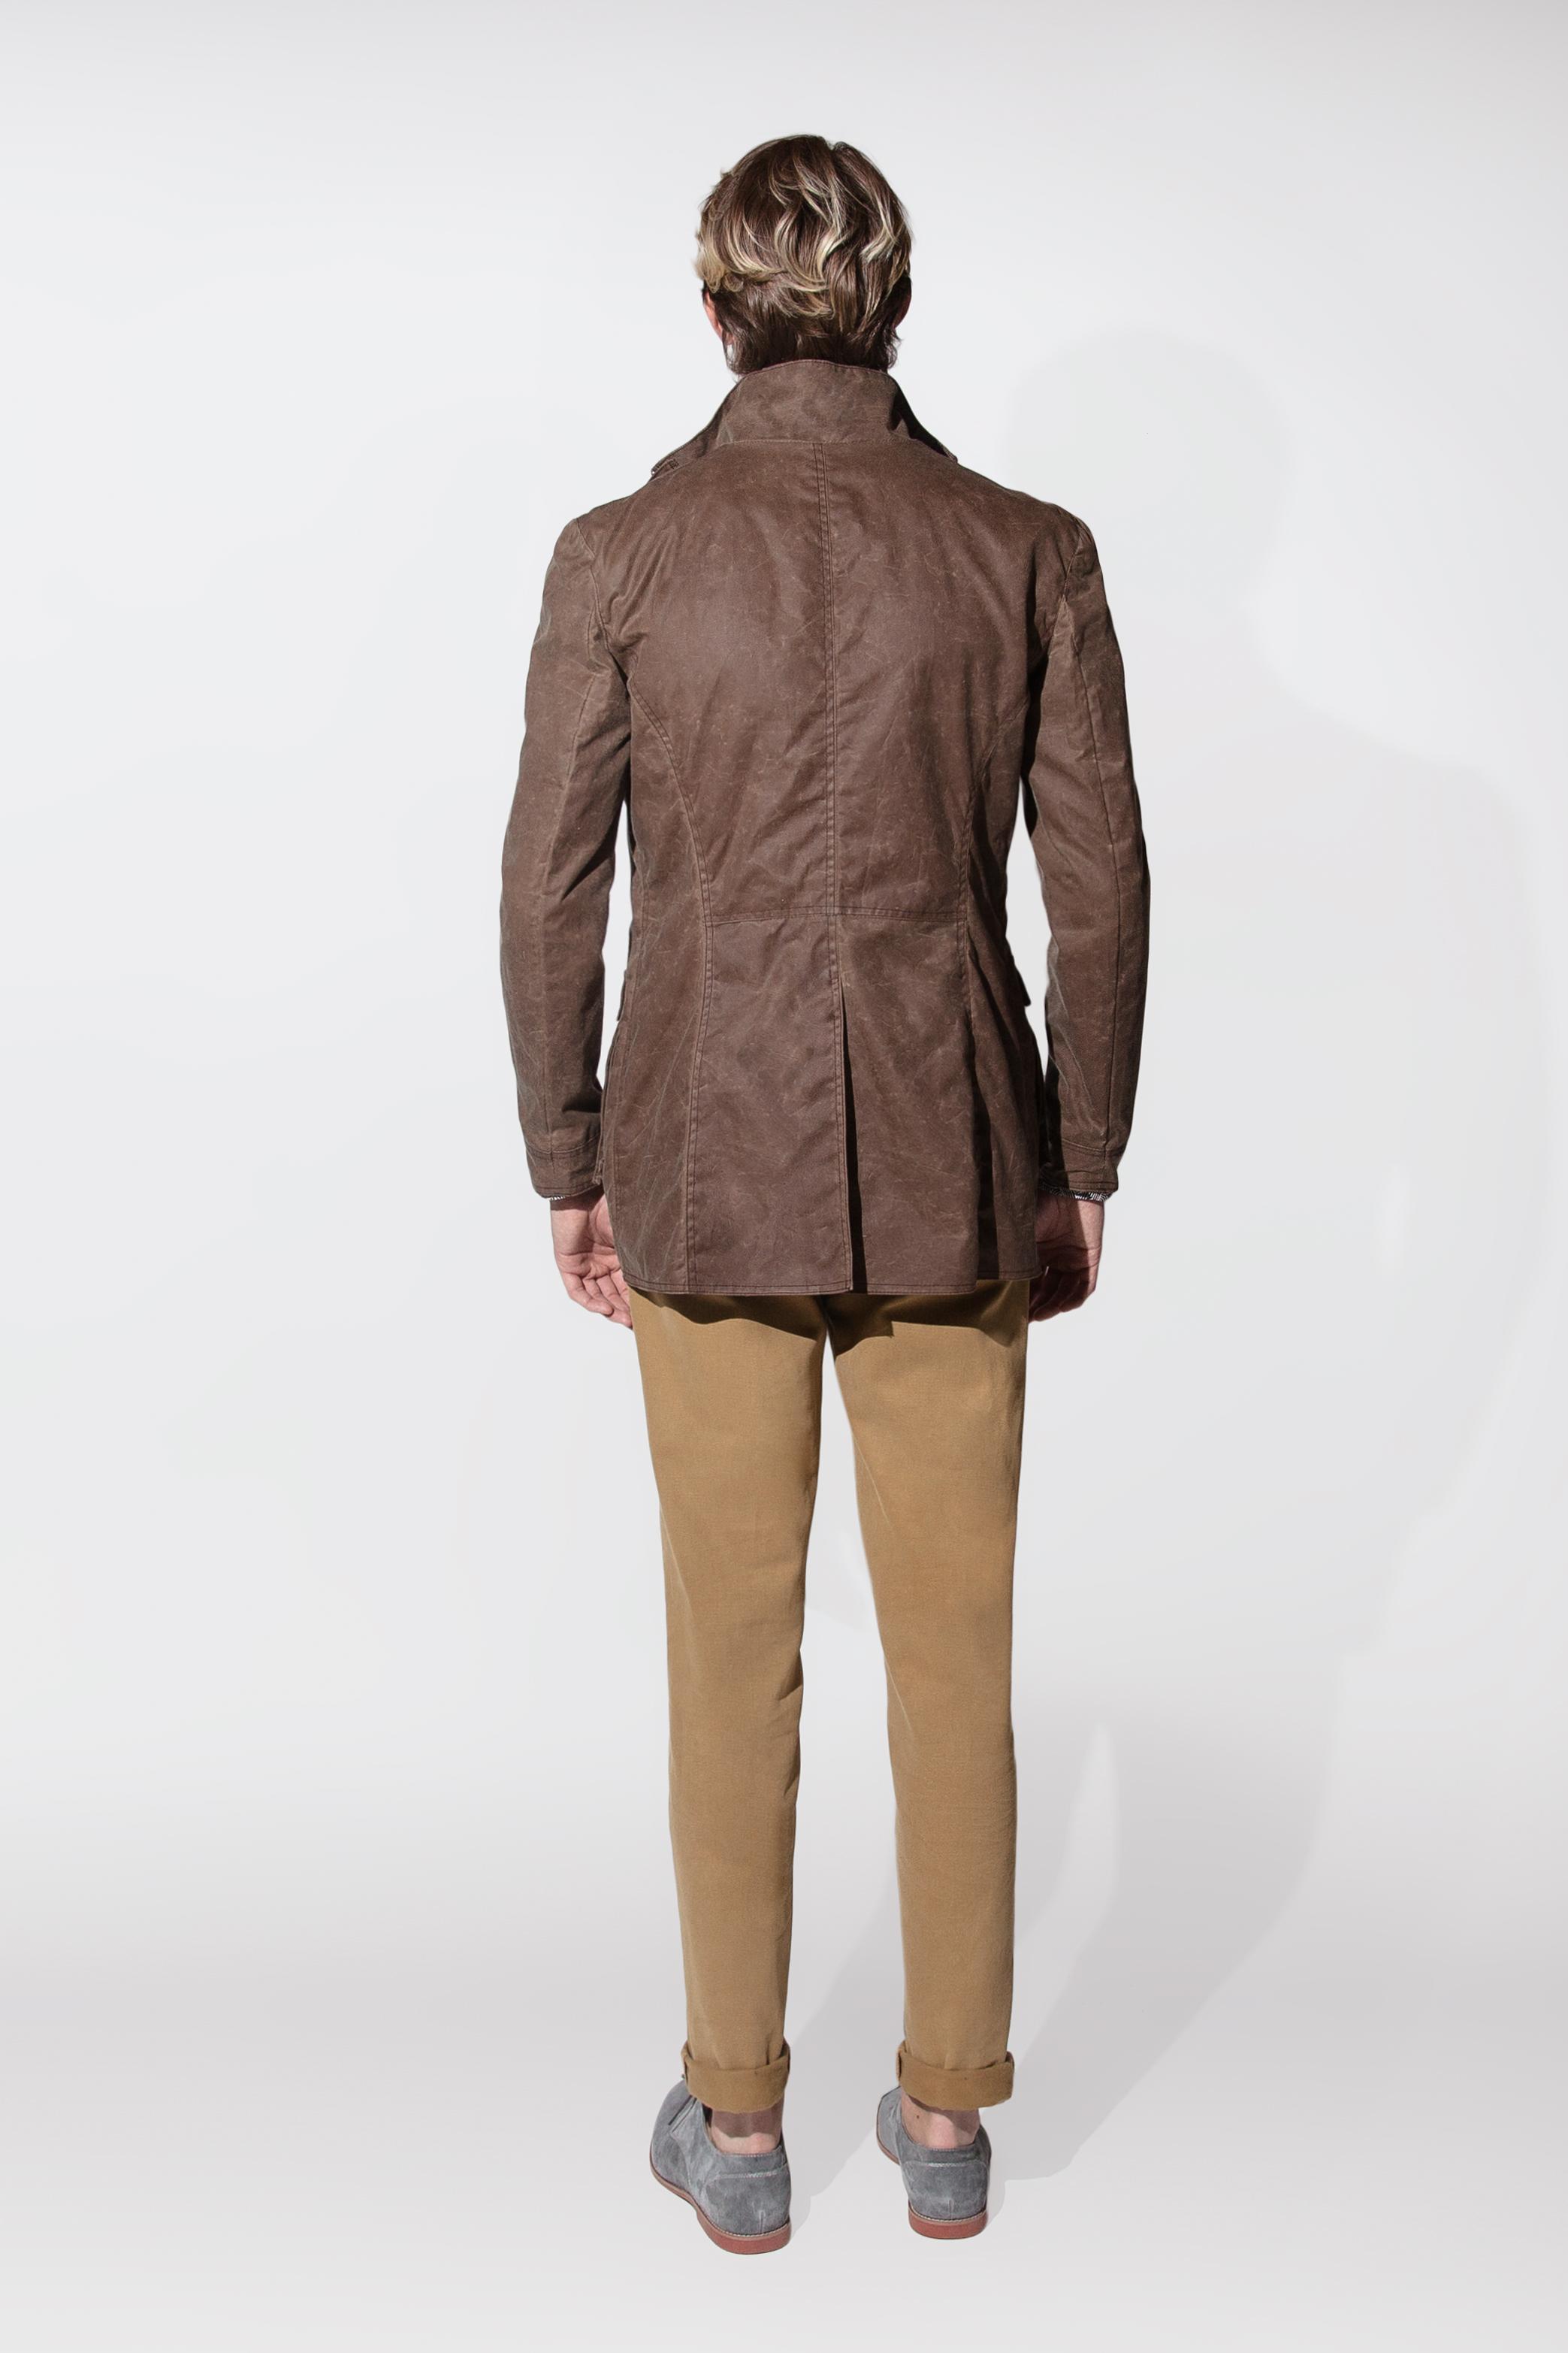 waxed cotton jacket $795